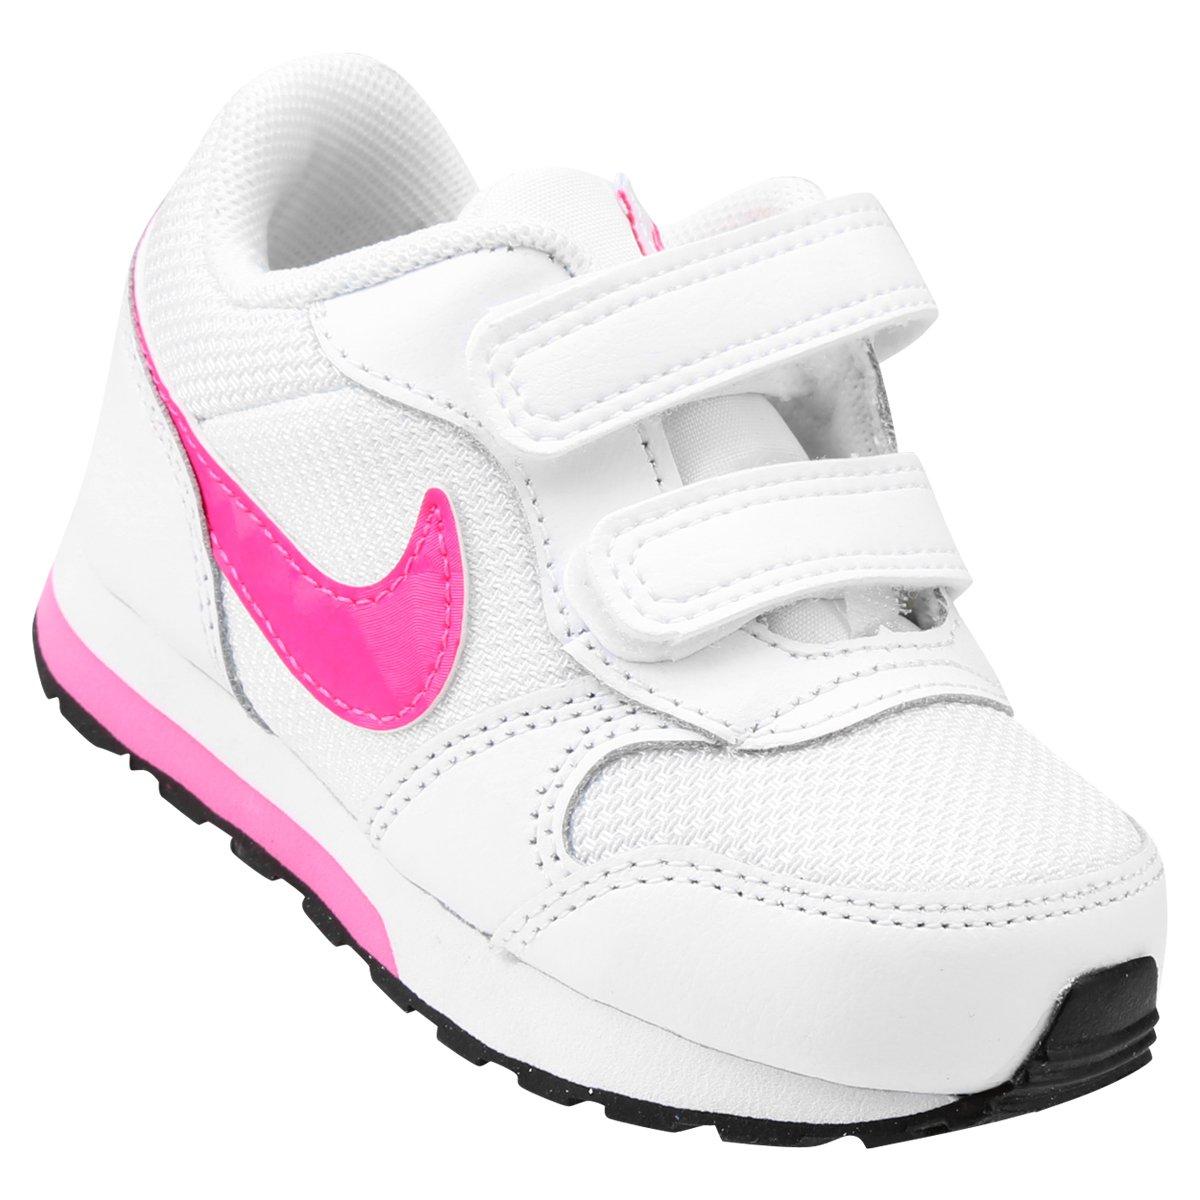 f0dae83181c Tênis Infantil Nike Md Runner 2 - Branco e Rosa - Compre Agora ...